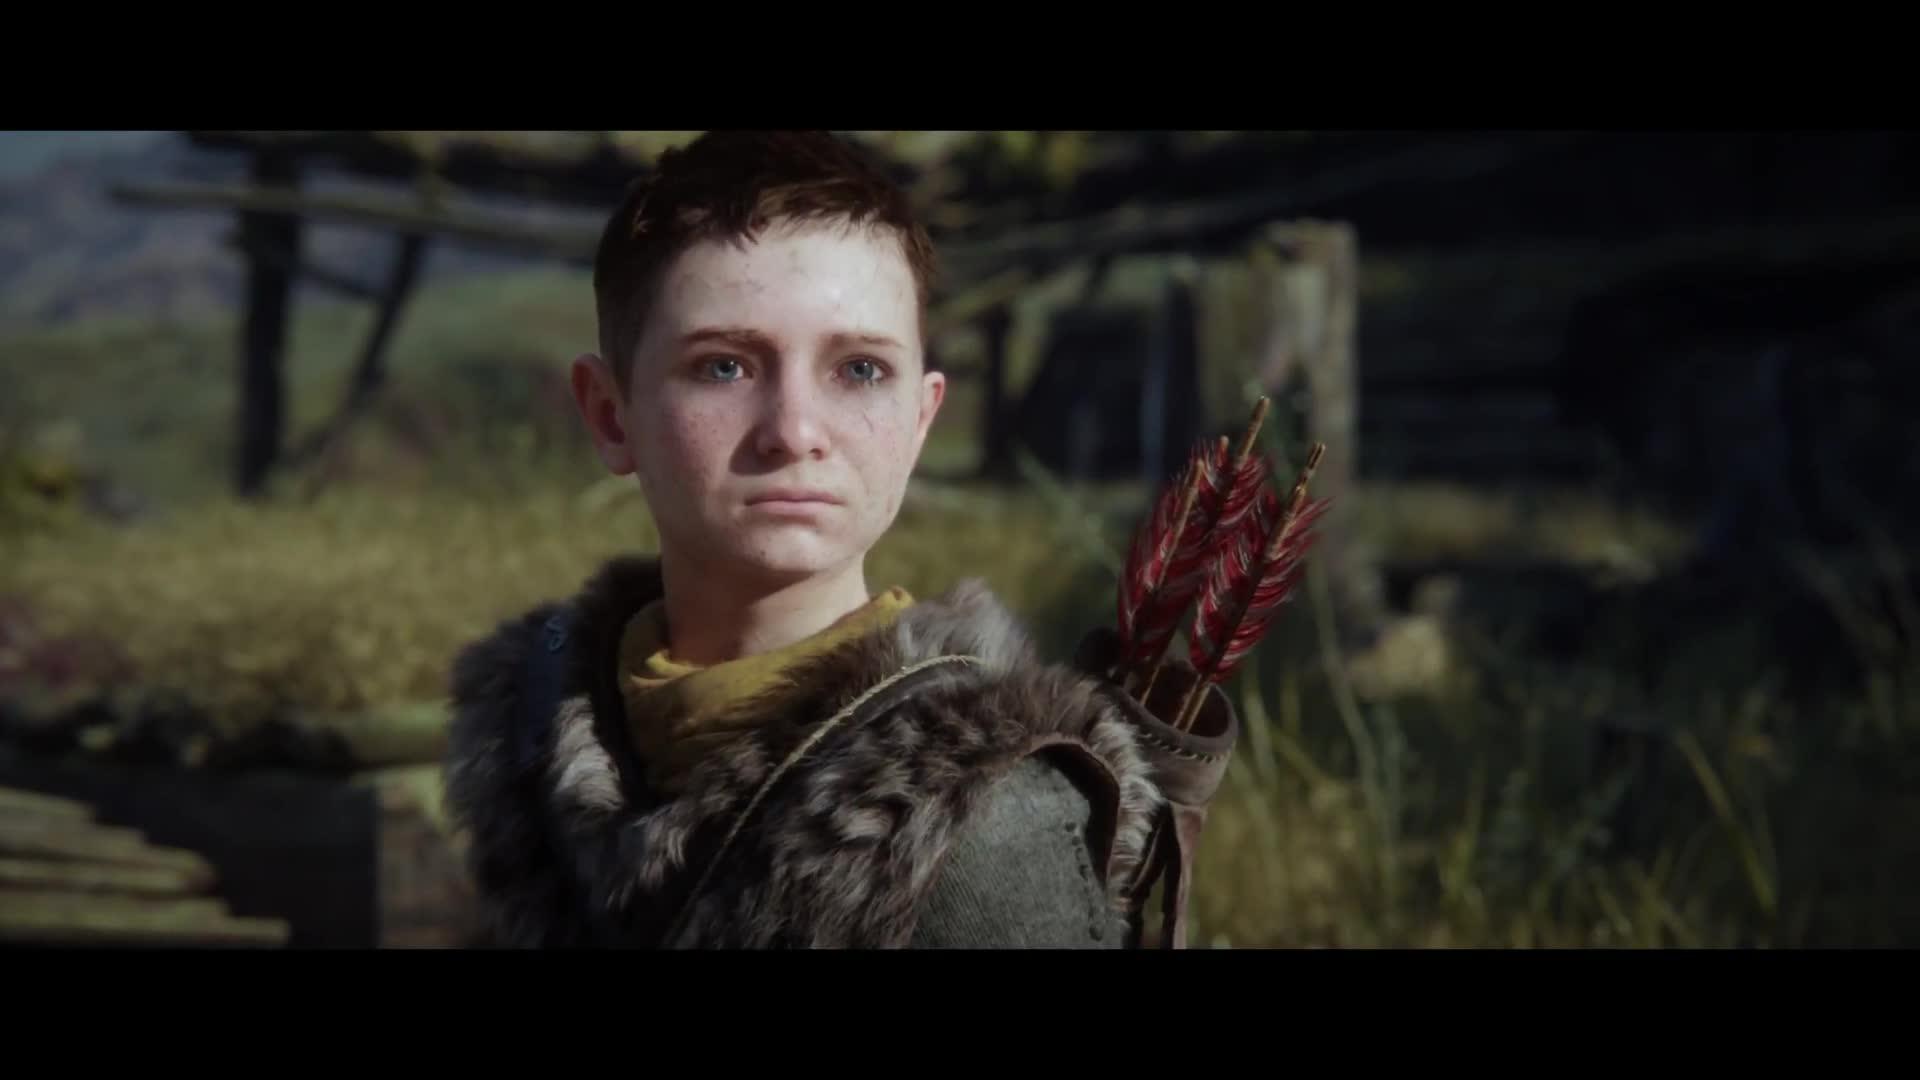 Atreus, Cory Barlog, E3, E3 2017, Gameplay, God of War, Incredible, Kratos, Mythology, Norse, God of War – Full TV Commercial | PS4 GIFs